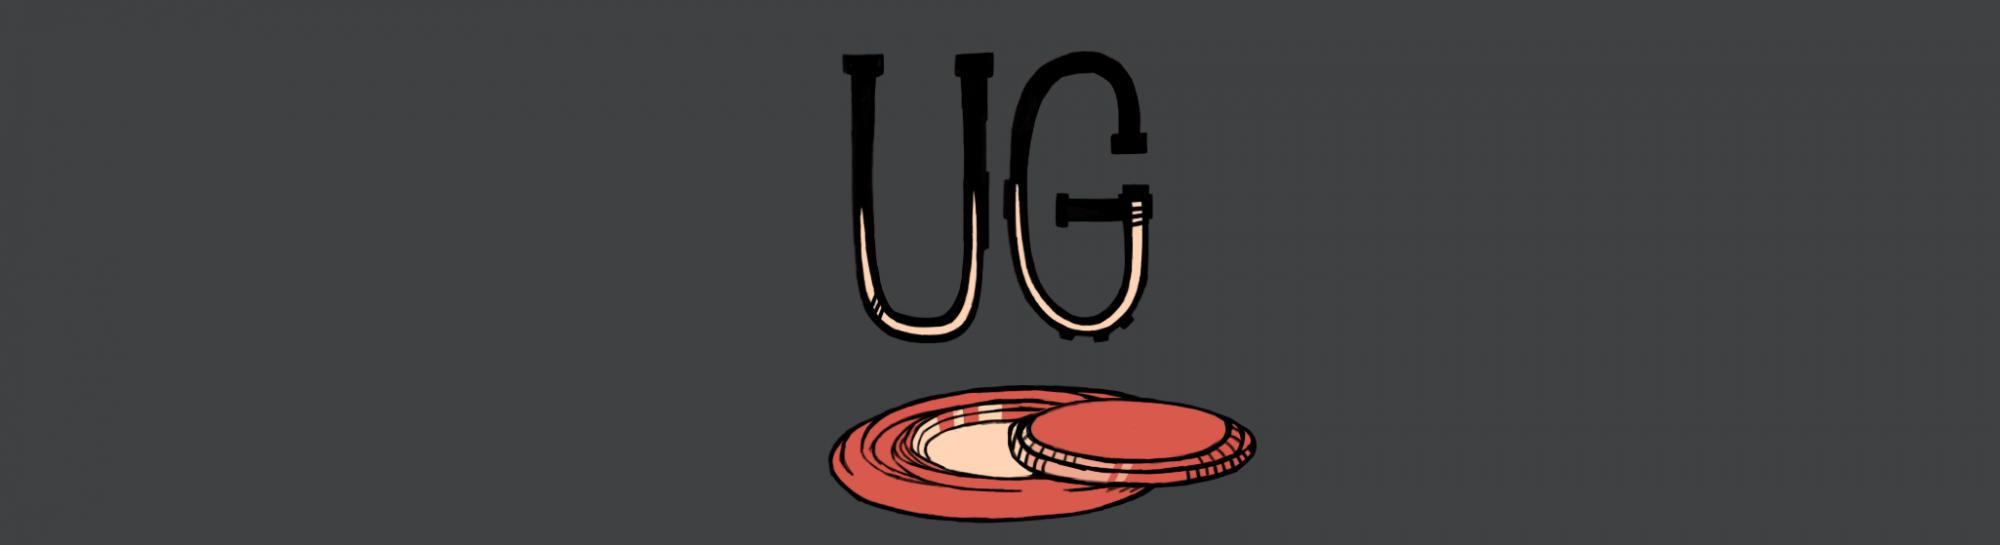 Undergroundies     Game Design And Illustration